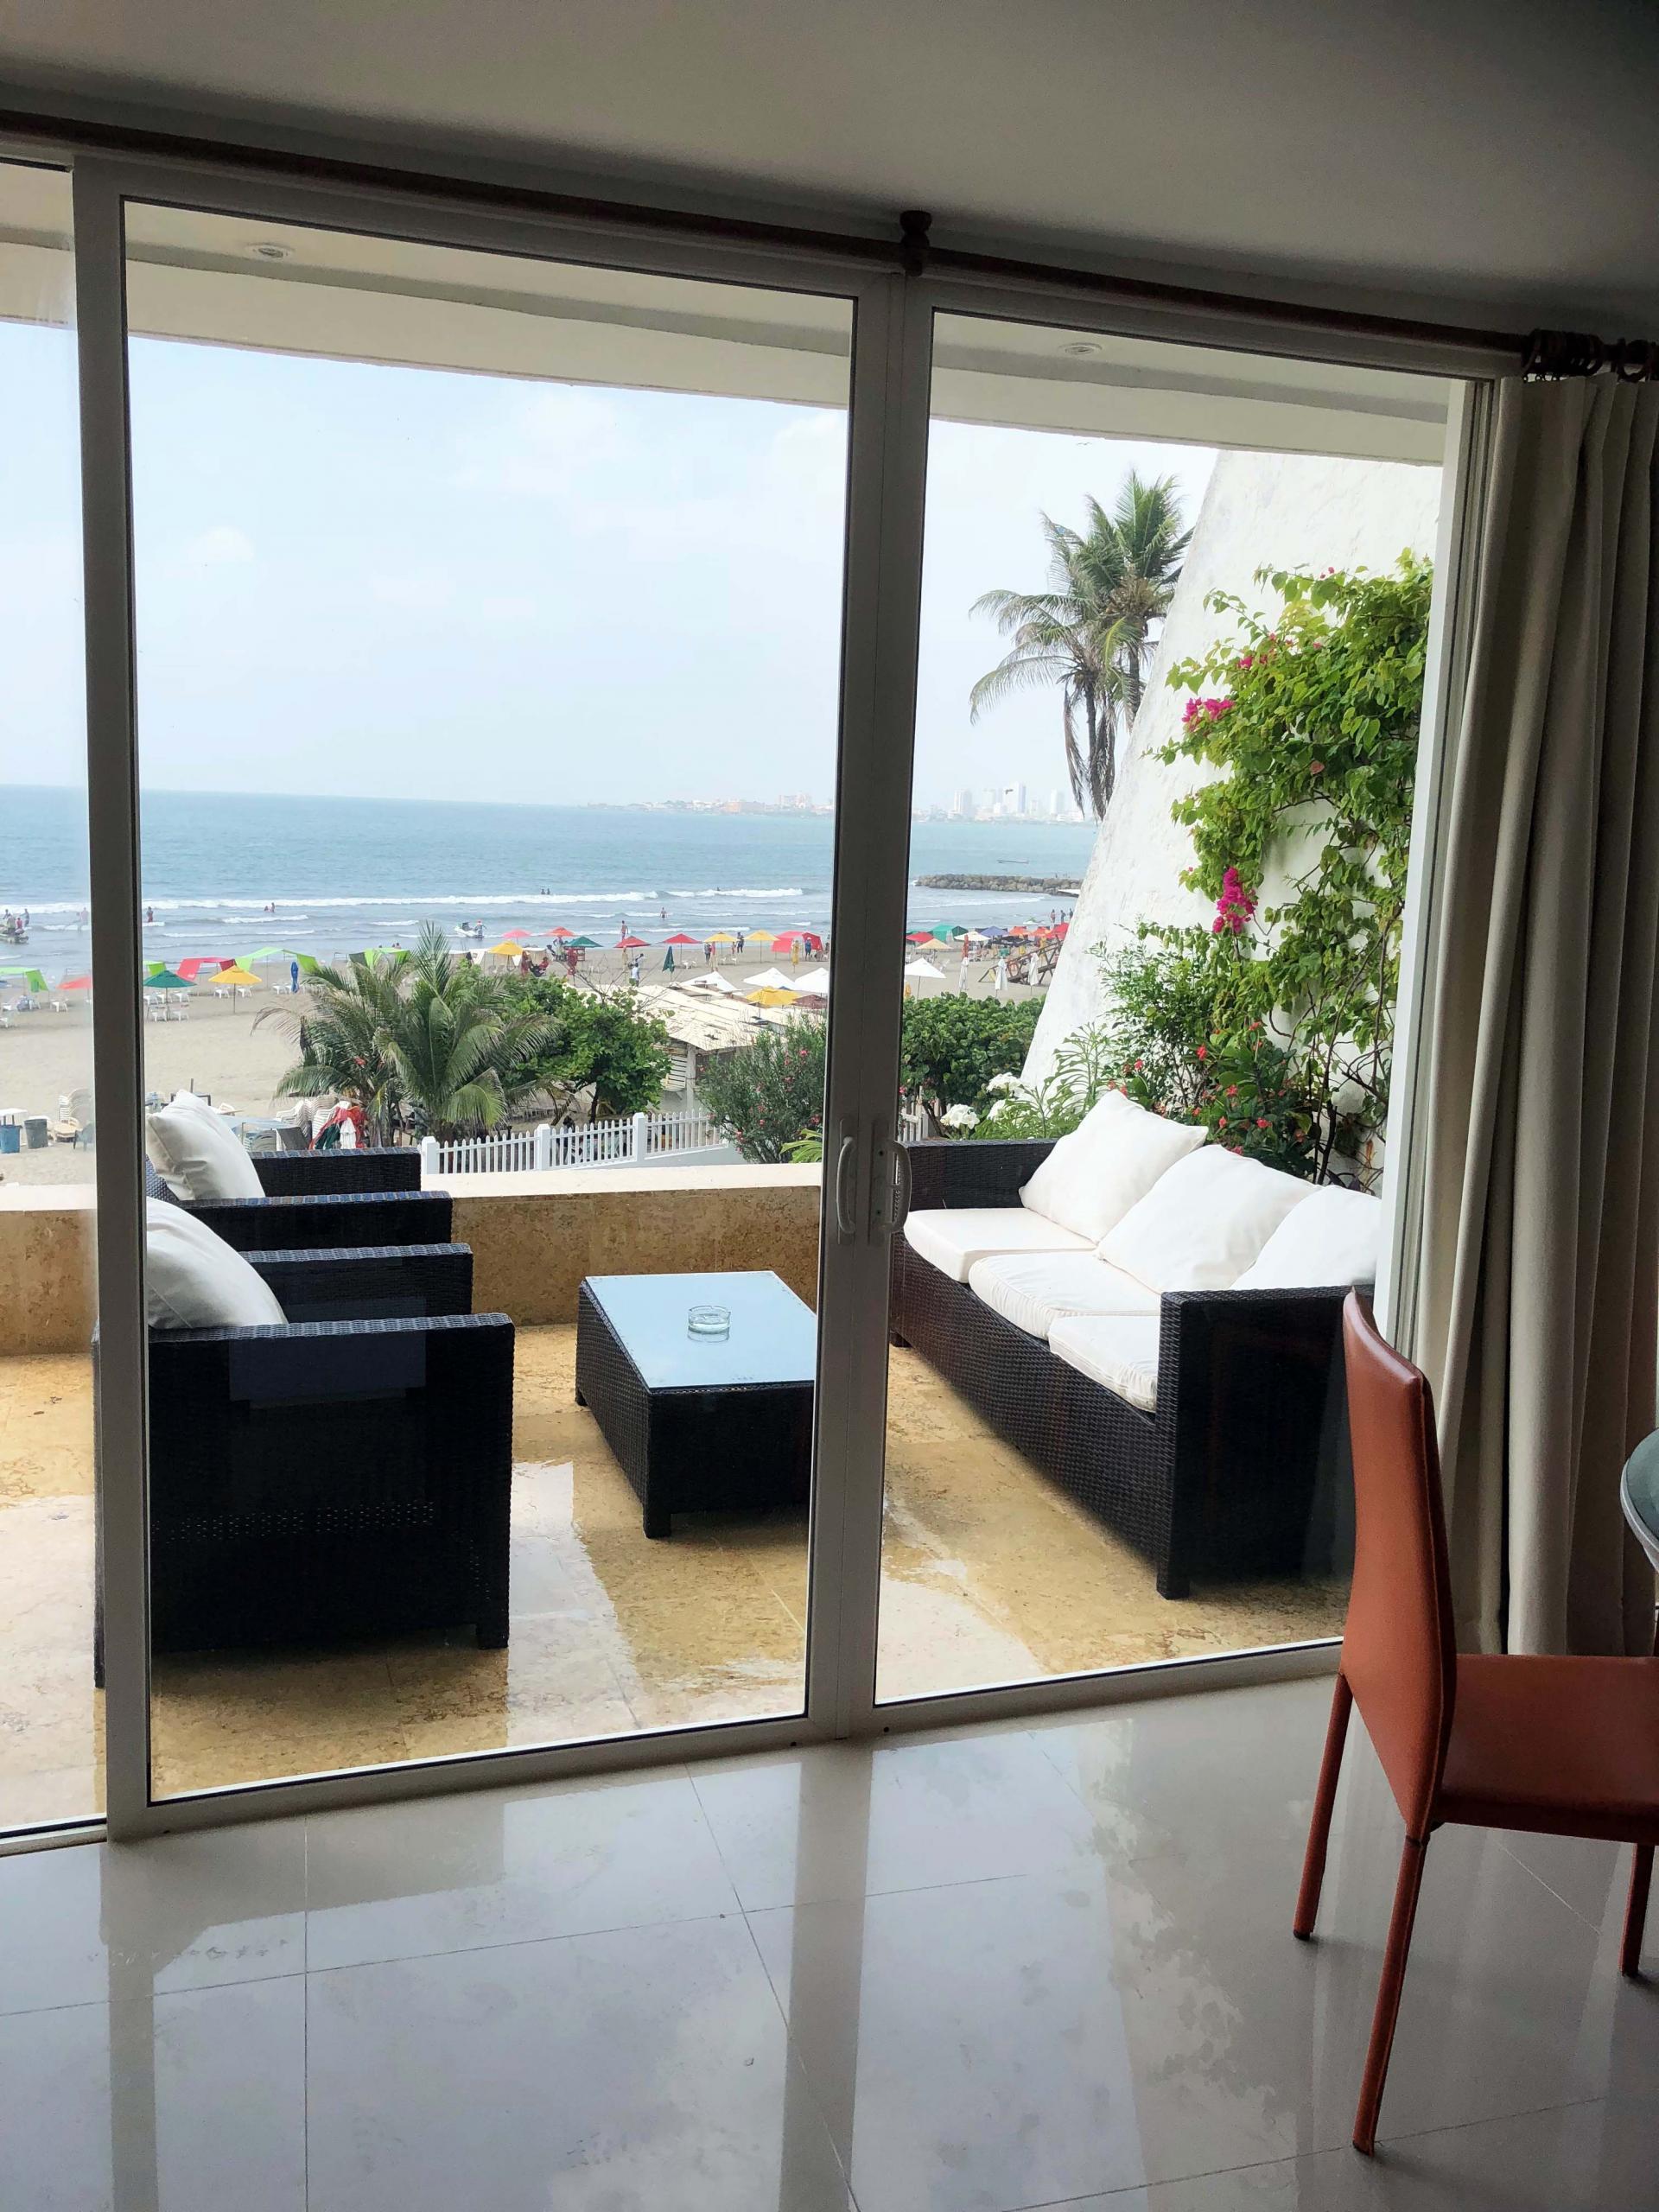 CARTAGENA - El Laguito - Very Impressive Beachfront apartment, beautifully renovated